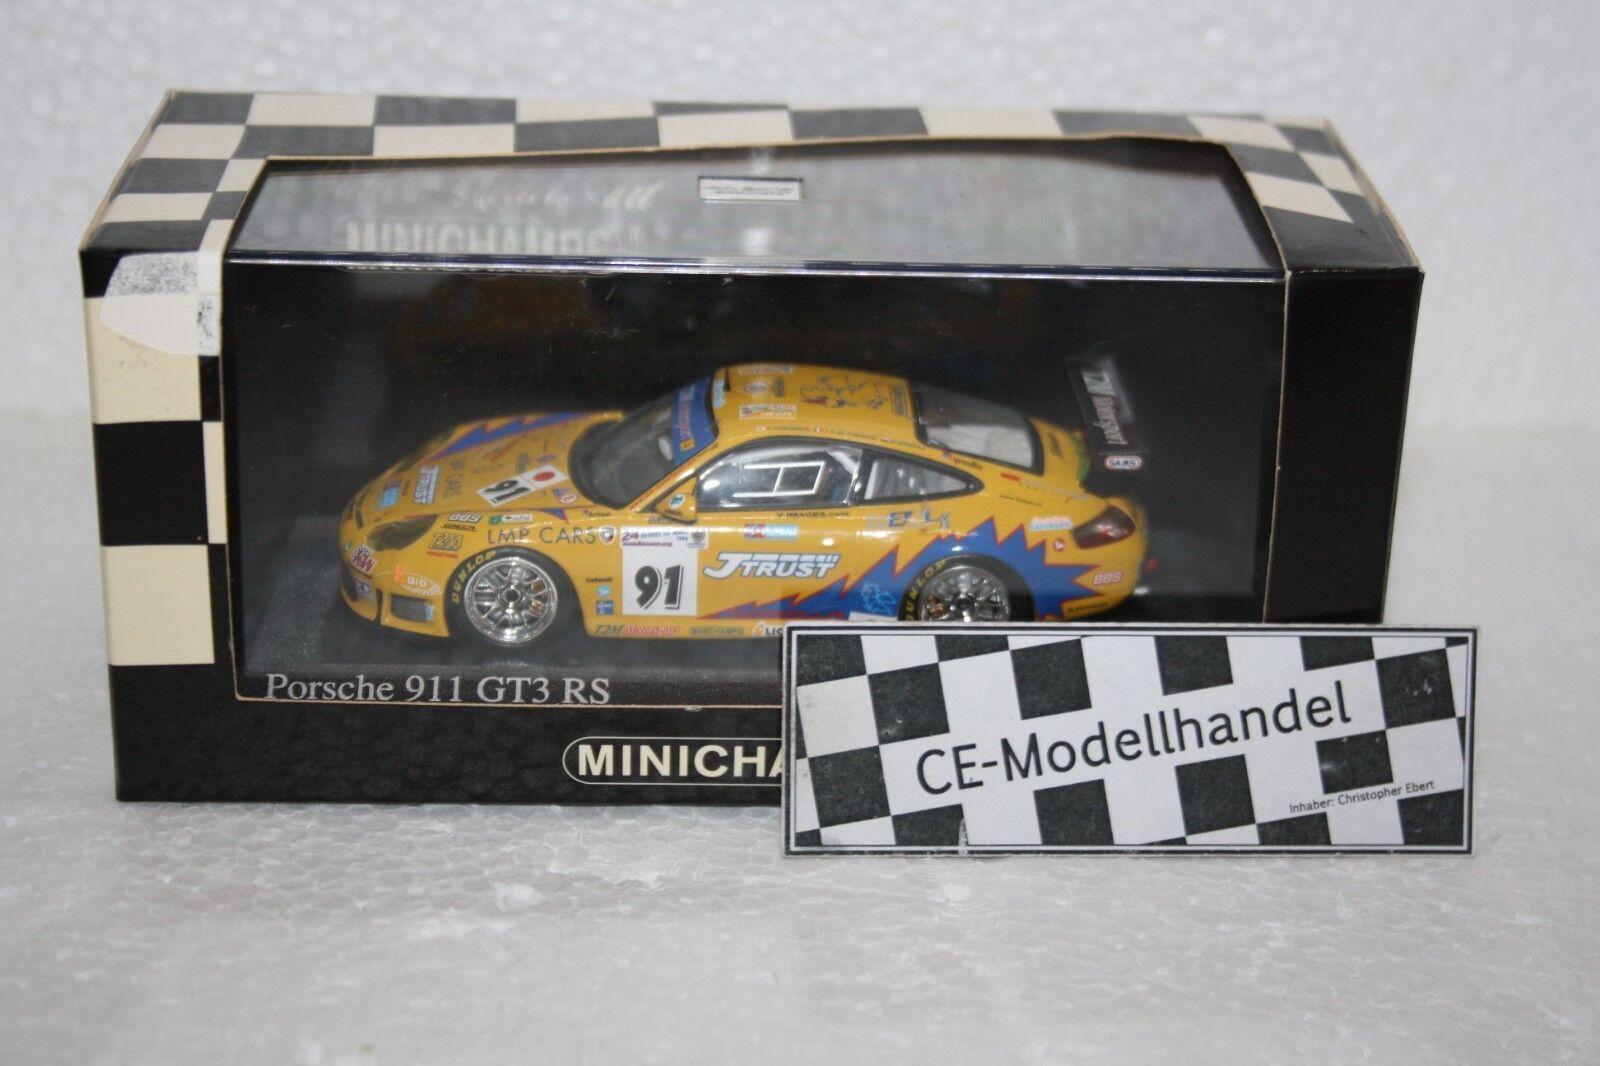 Porsche 911 GT3 RS   91 24h Le Mans • 2006 • Minichamps • 1 43  | Fein Verarbeitet